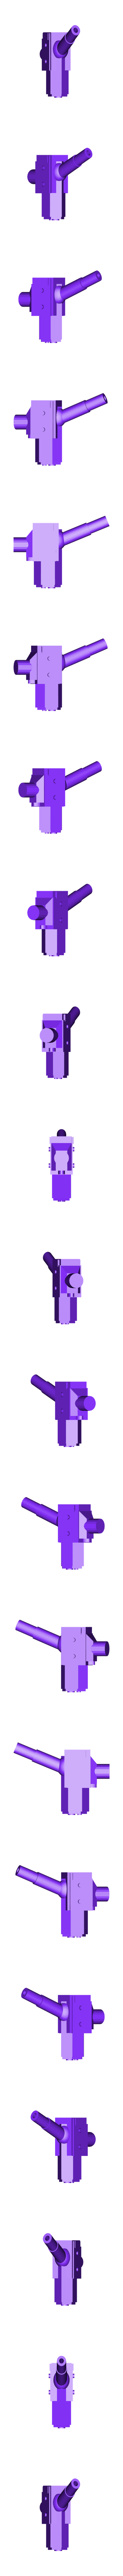 Shoulder_Antenna.stl Download free STL file Modular Linebacker Mech • 3D printing object, mrhers2